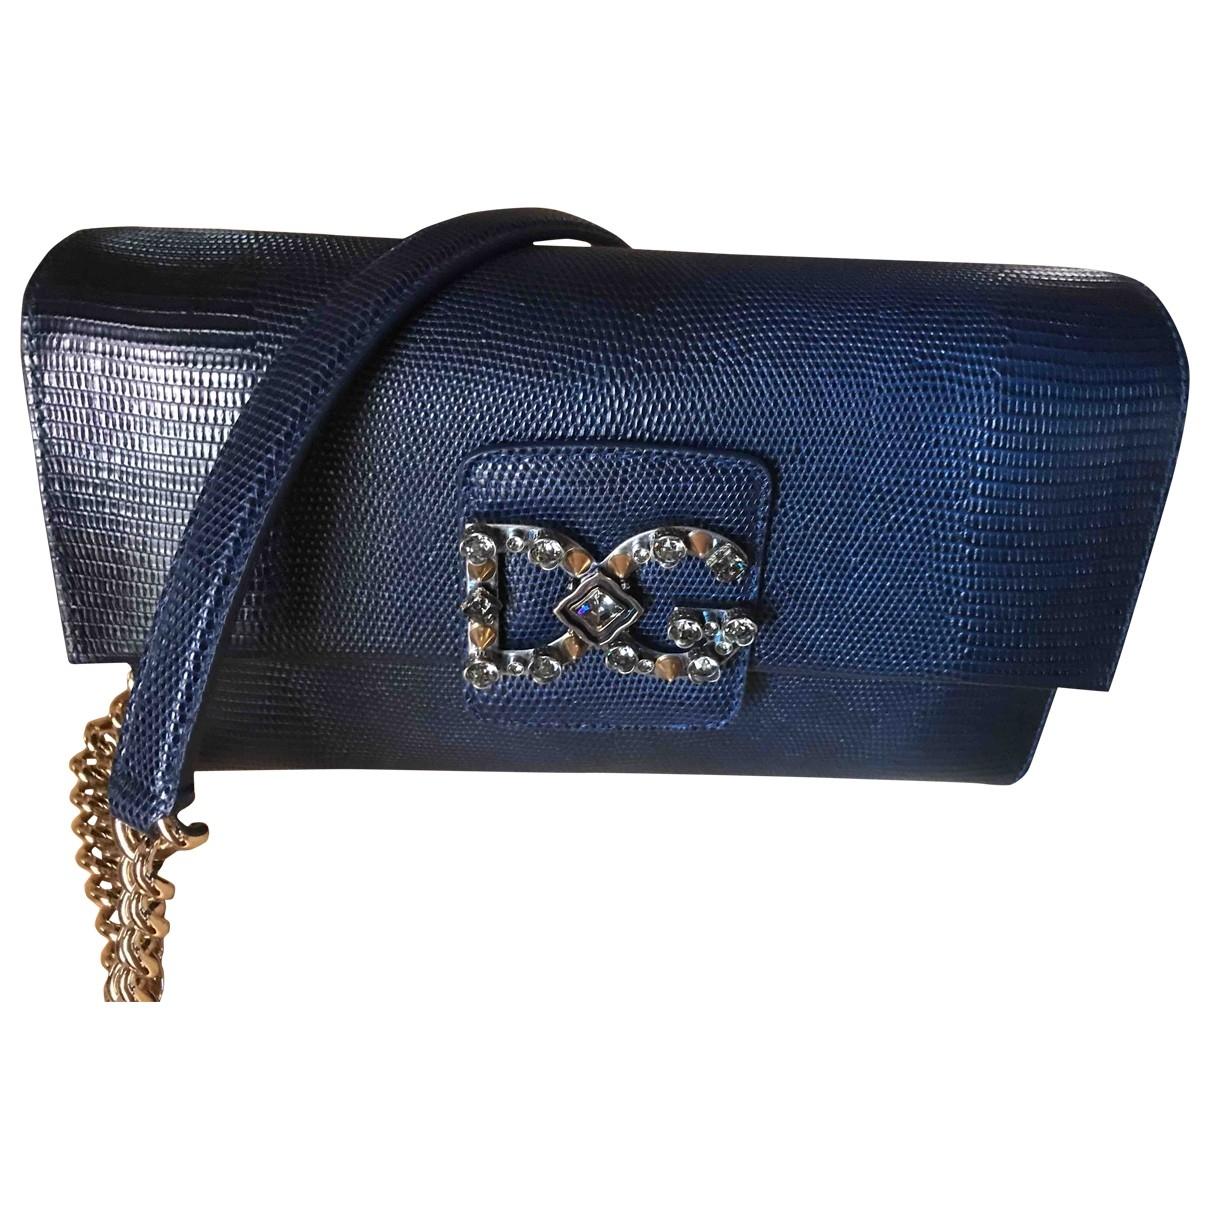 Dolce & Gabbana \N Blue Leather handbag for Women \N